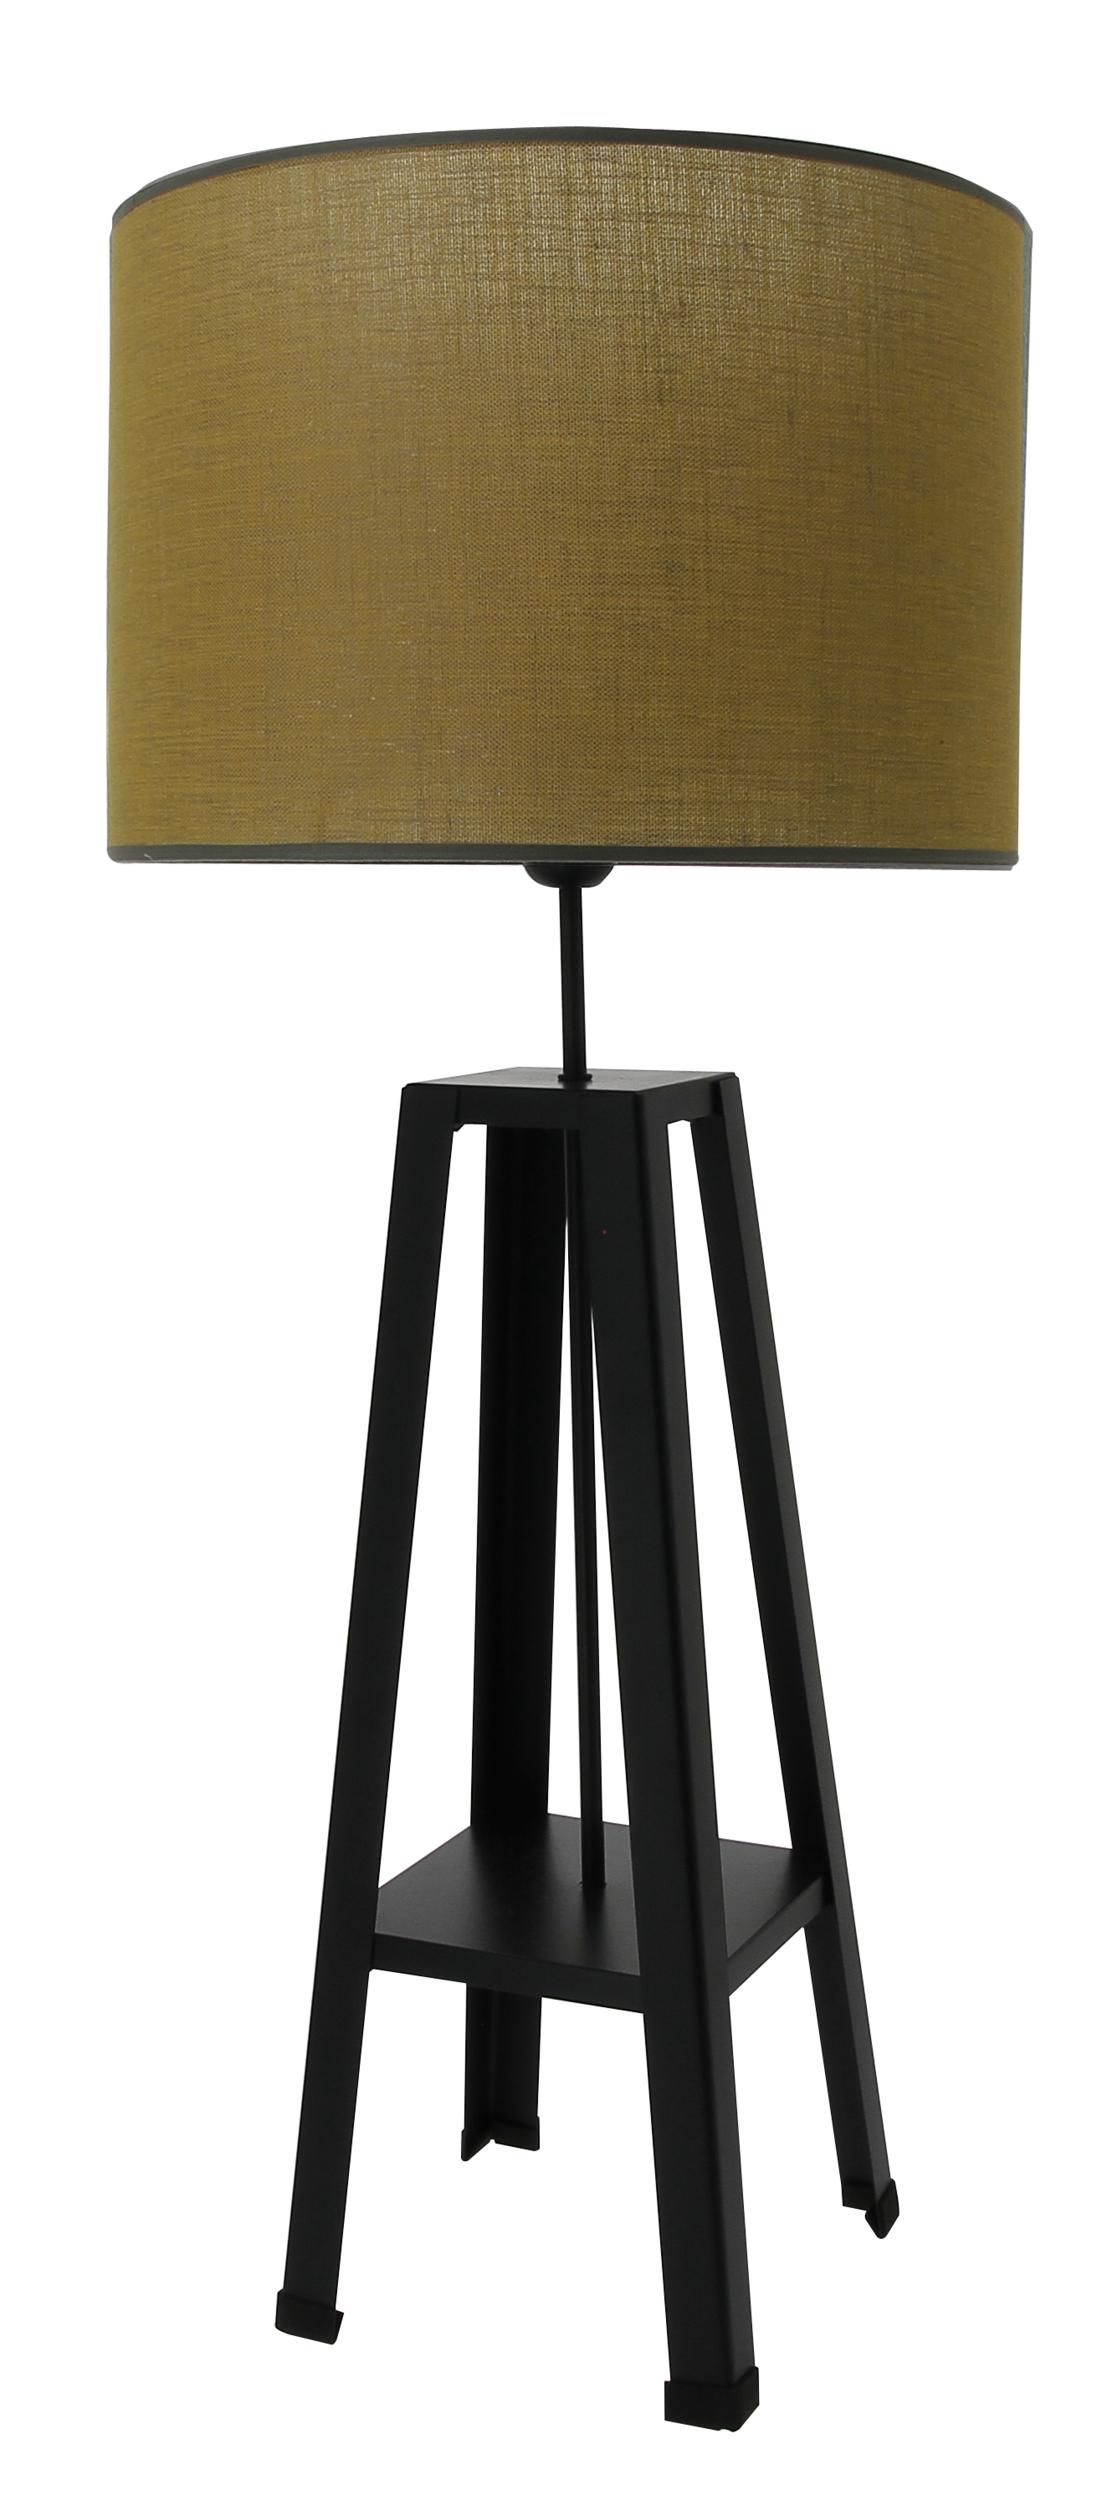 Lampe Atelier Jaune Moutarde Lampes E Metropolight